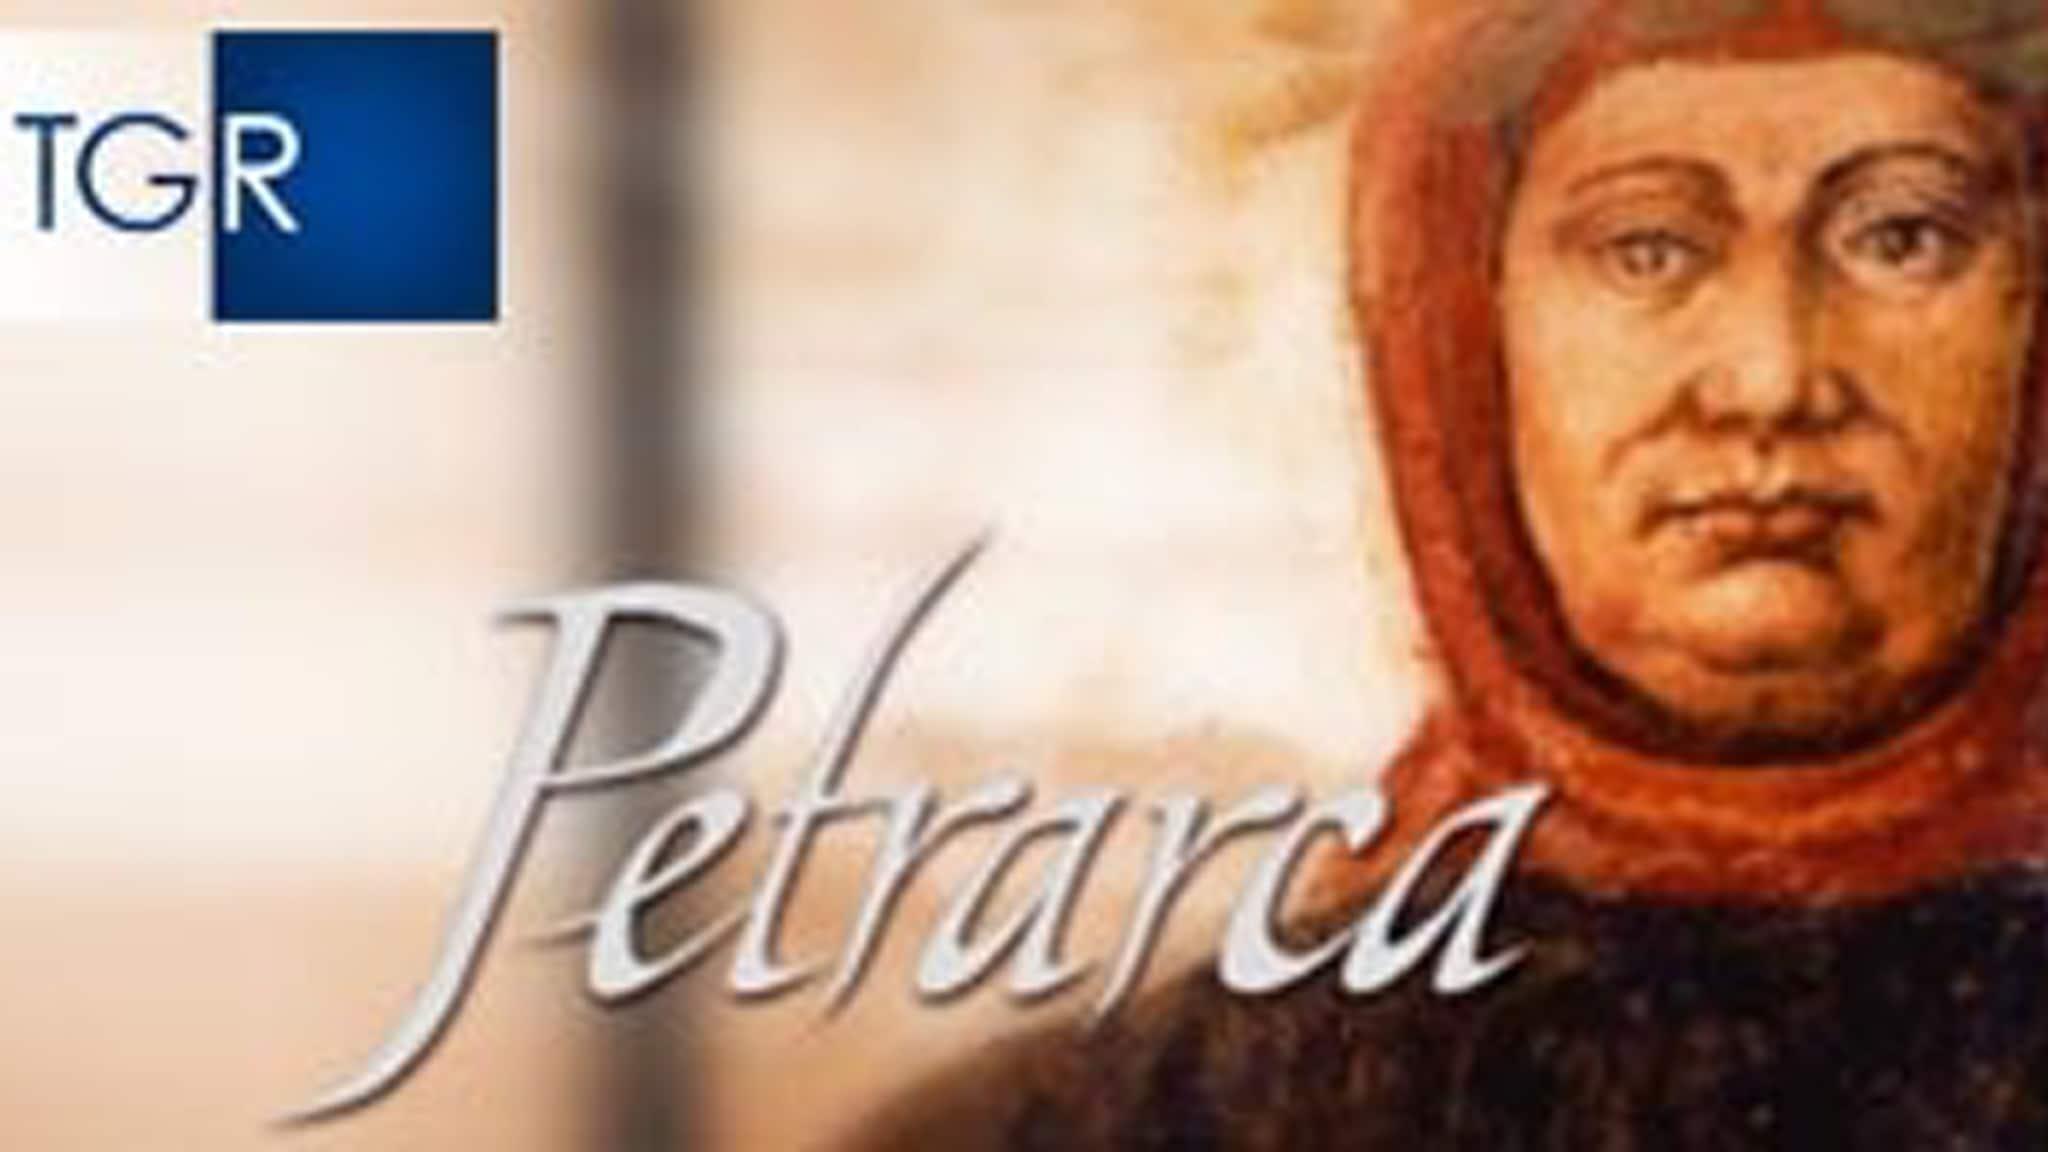 Rai 3 TGR Petrarca